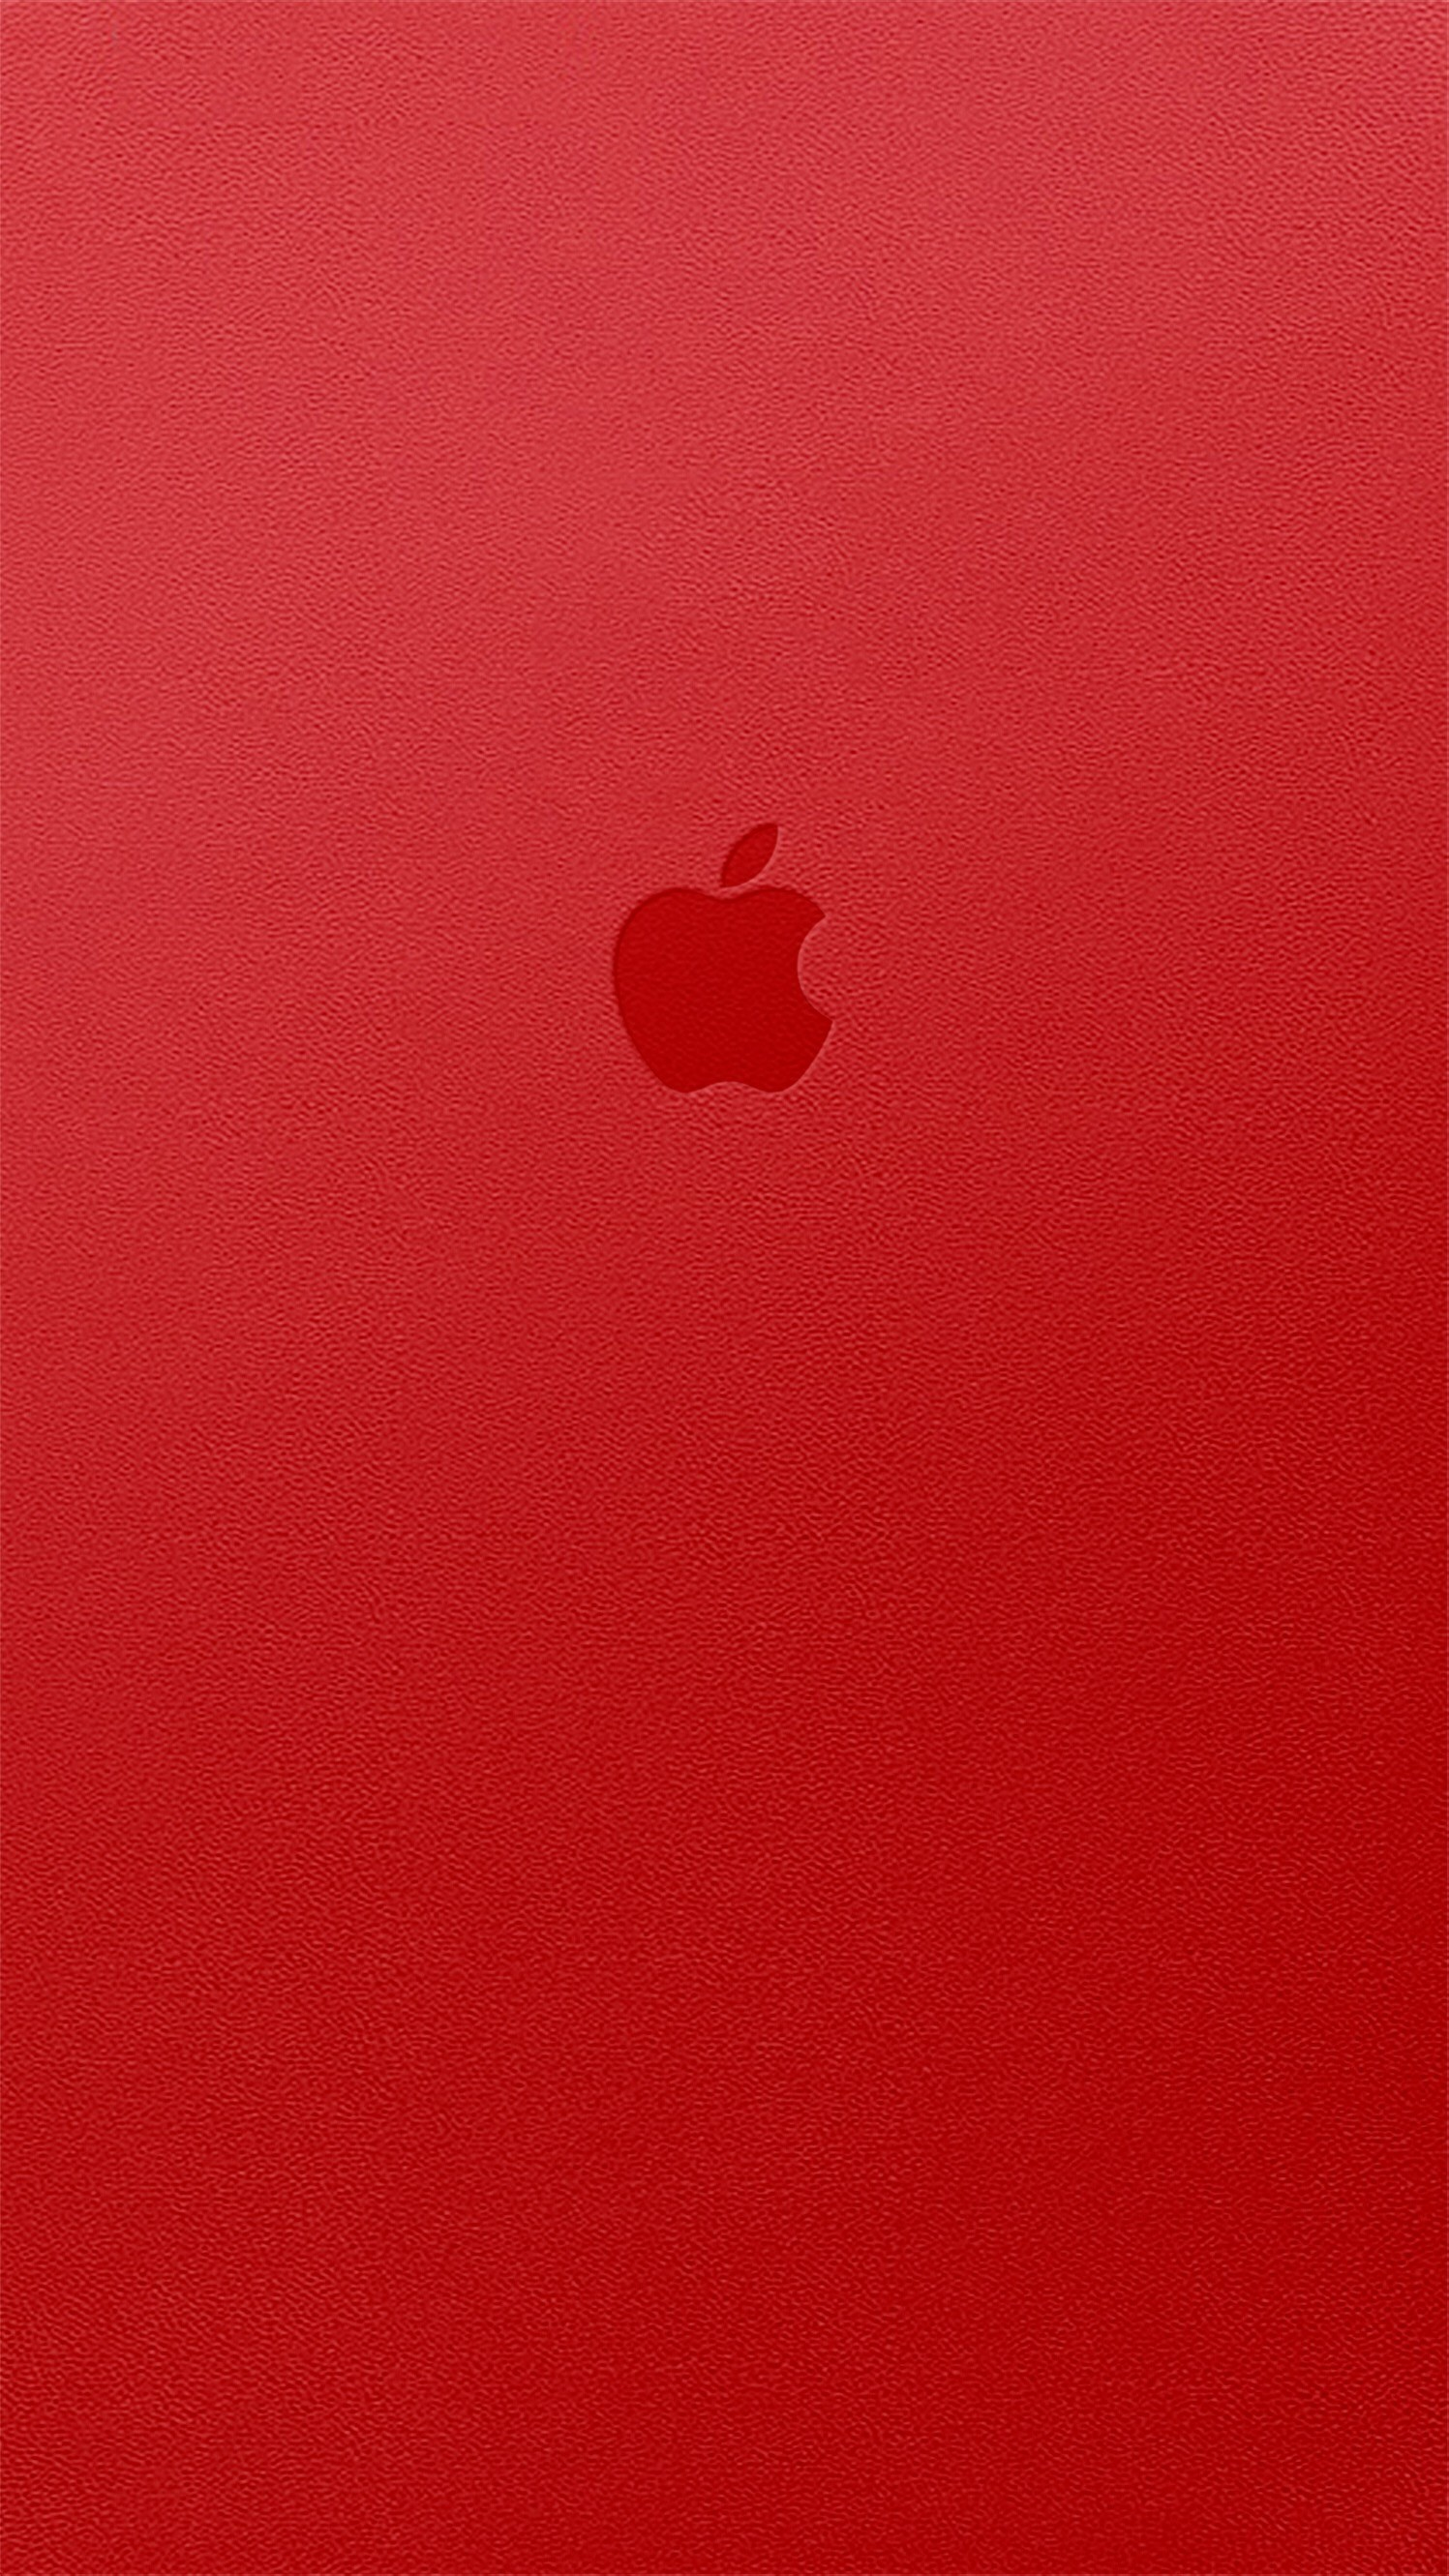 Product-Red-By-JasonZigrino.jpg